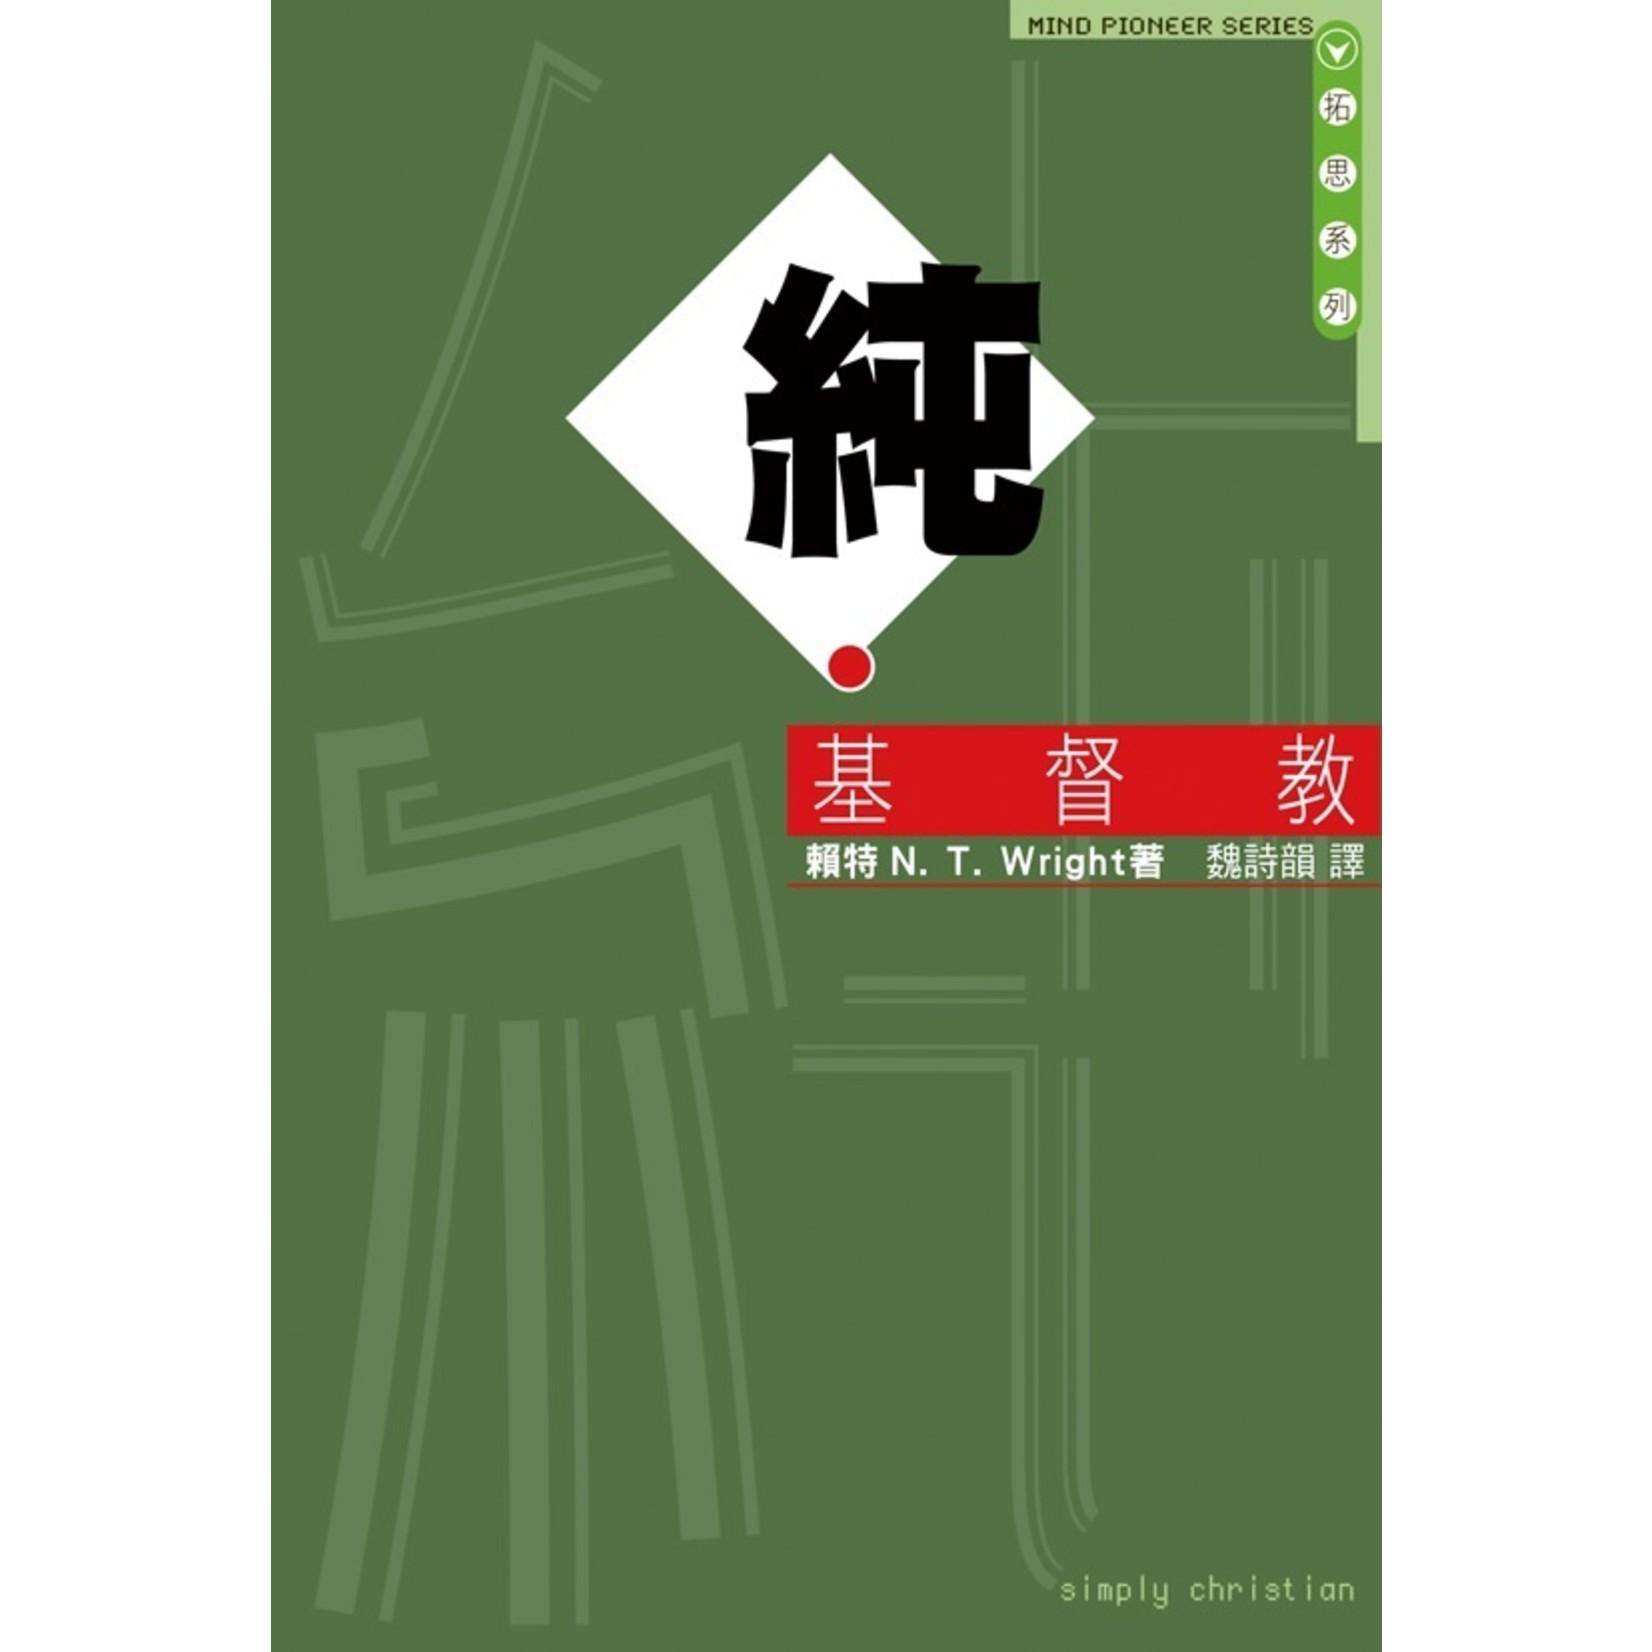 天道書樓 Tien Dao Publishing House 純.基督教 Simply Christian